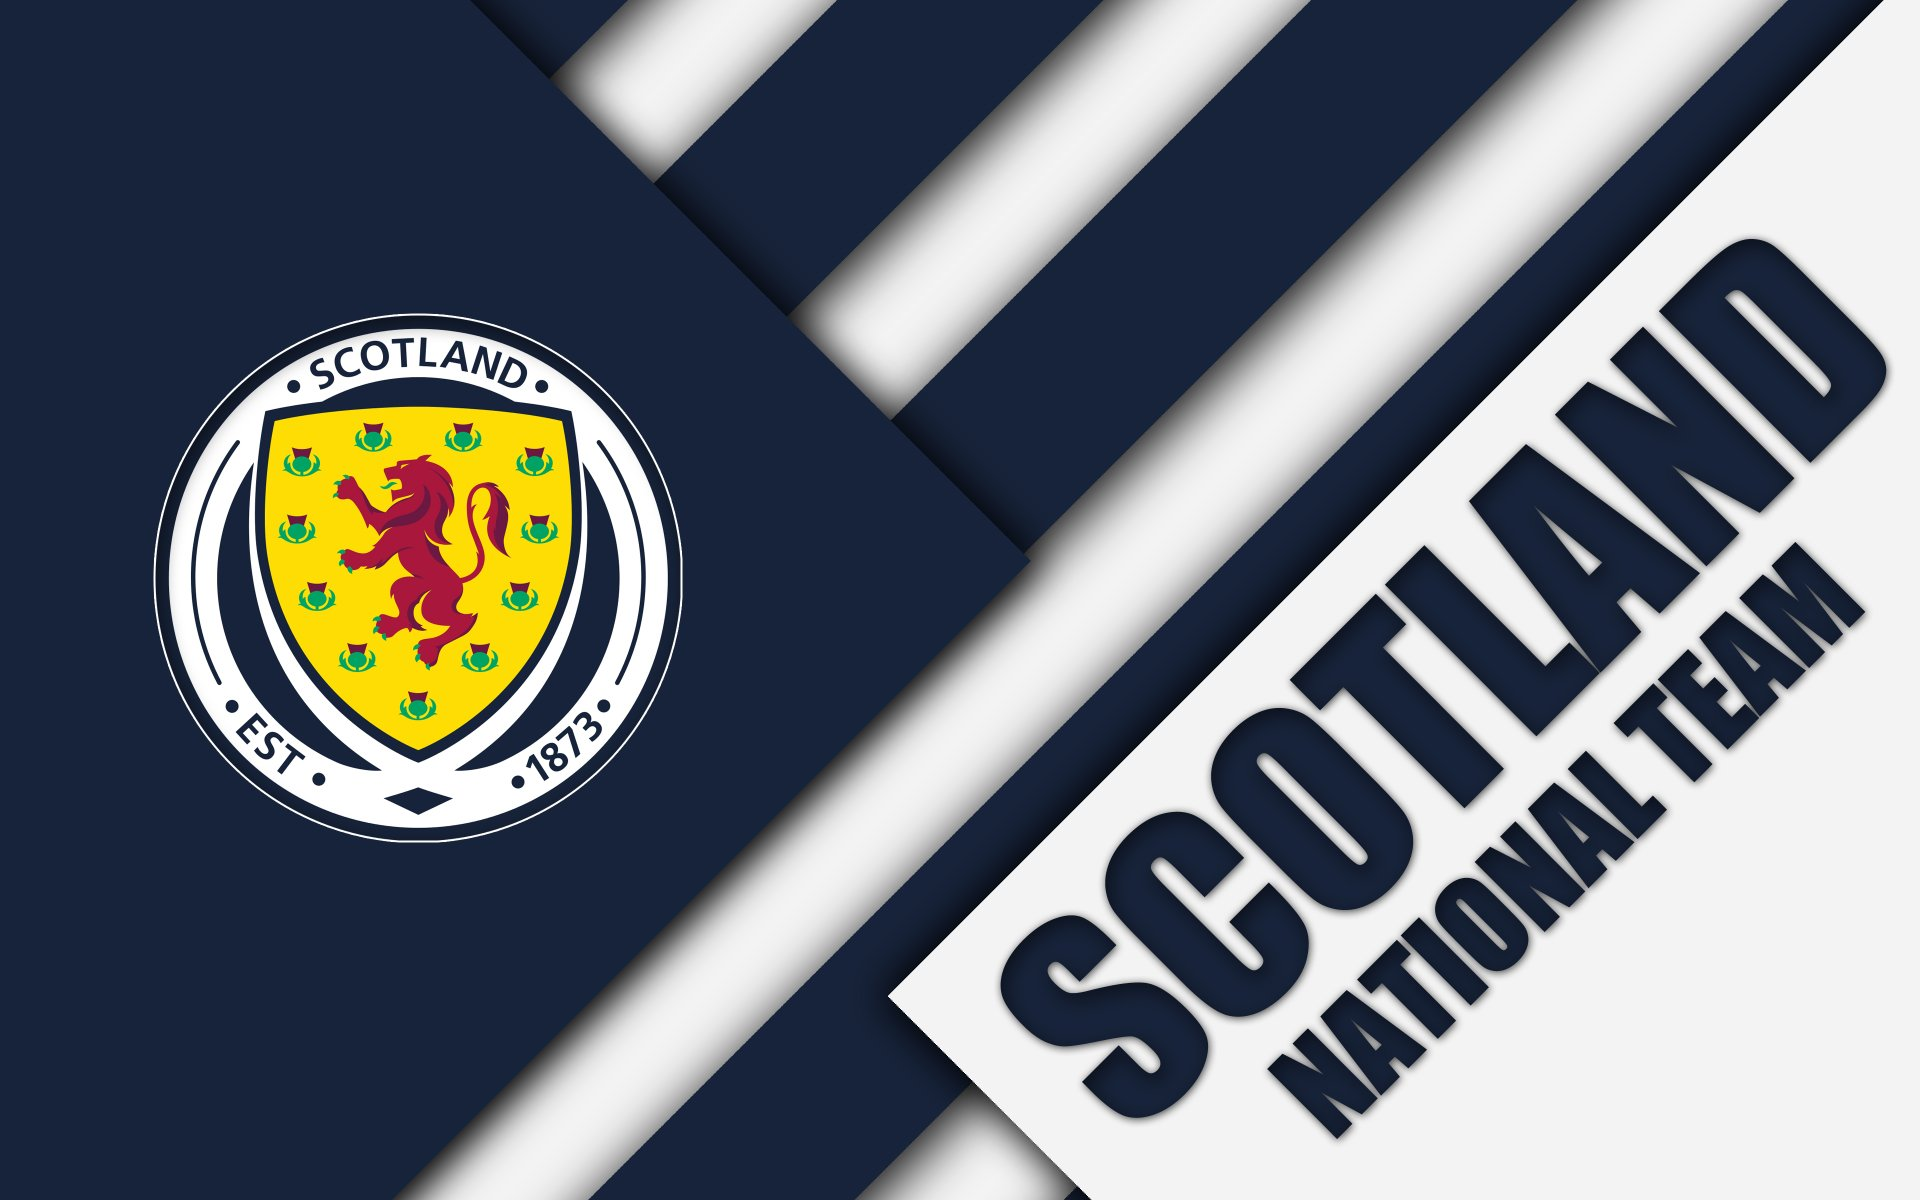 Scotland National Football Team Zoom Background 4